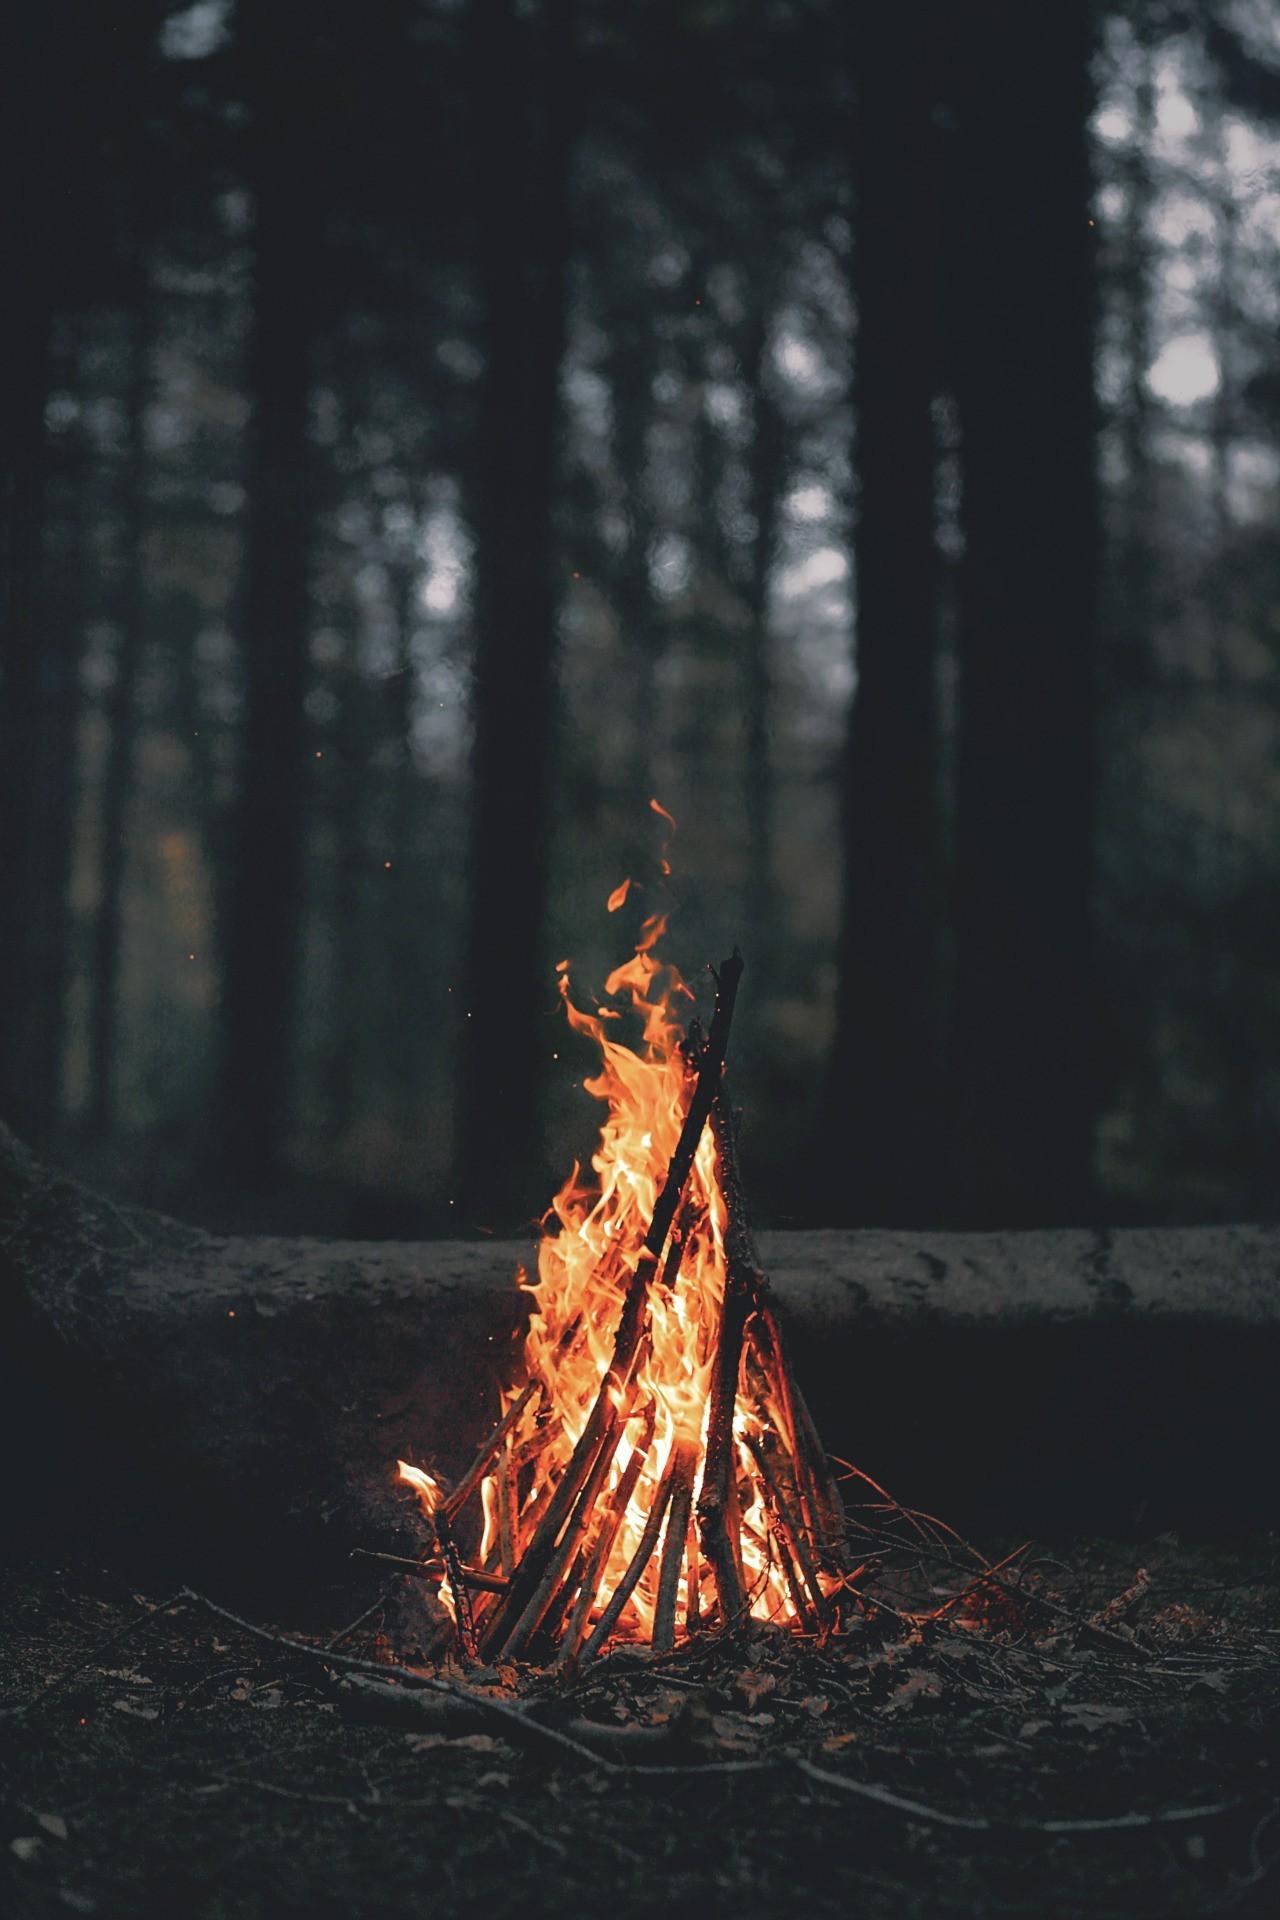 Sunlight Trees Forest Leaves Dark Night Nature Portrait Display Wood Branch Evening Fire Bonfires Campfire Light